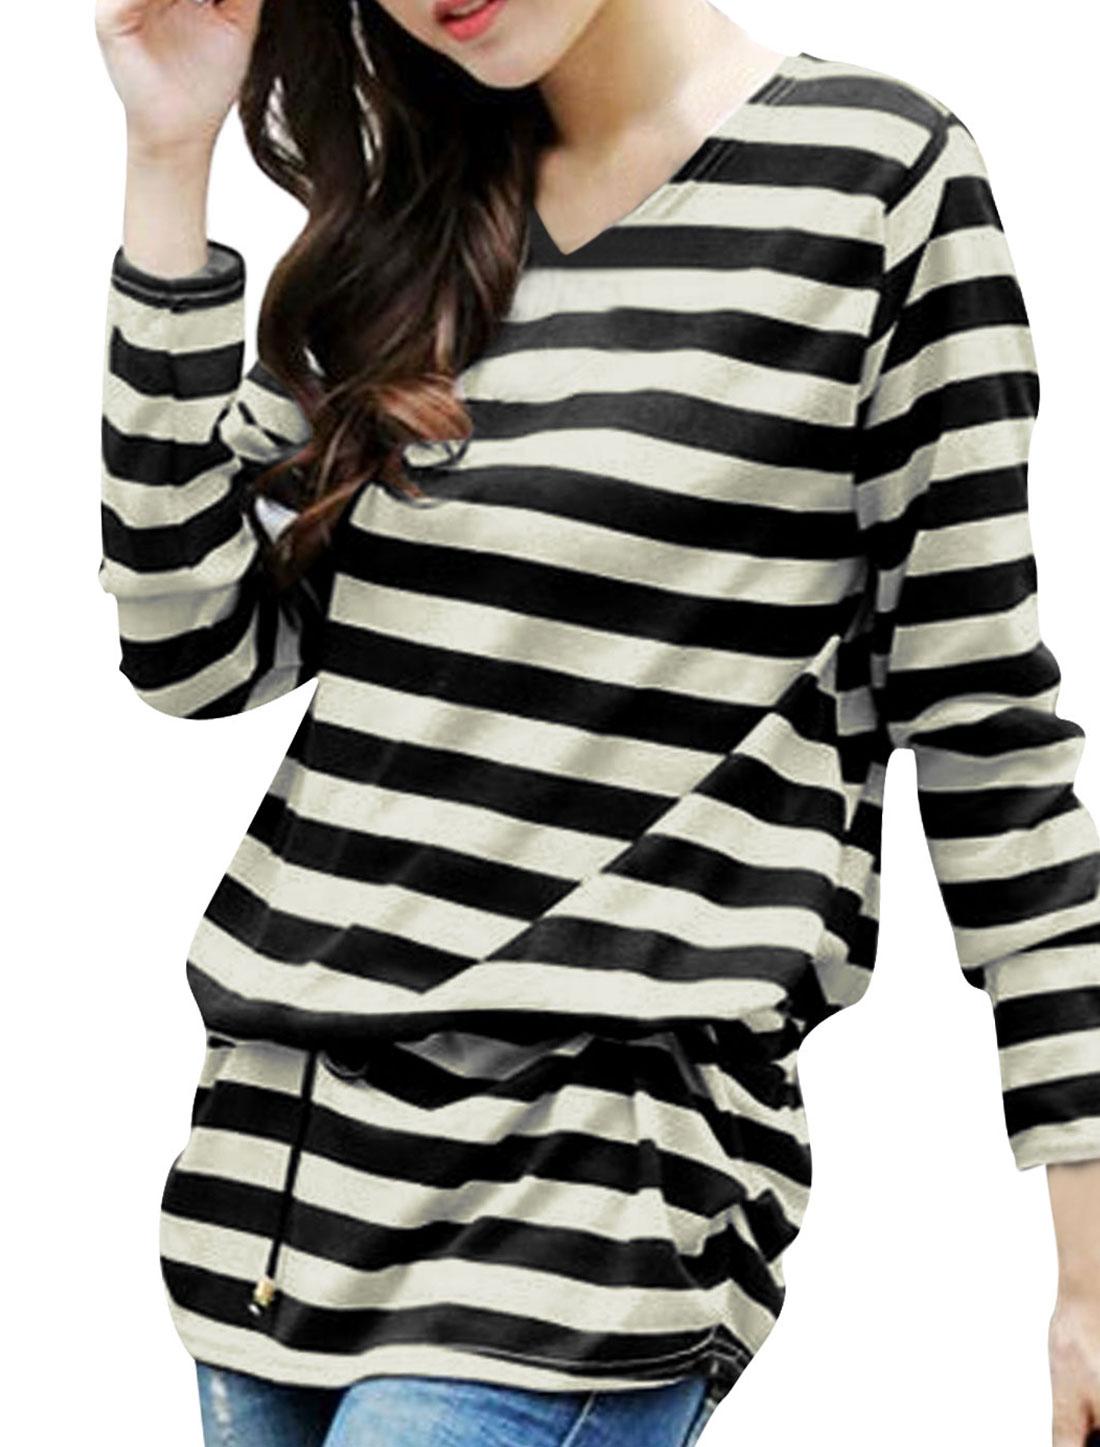 Women Stripes Shirred Sides Tunic Knit Top w Waist String Black Beige S